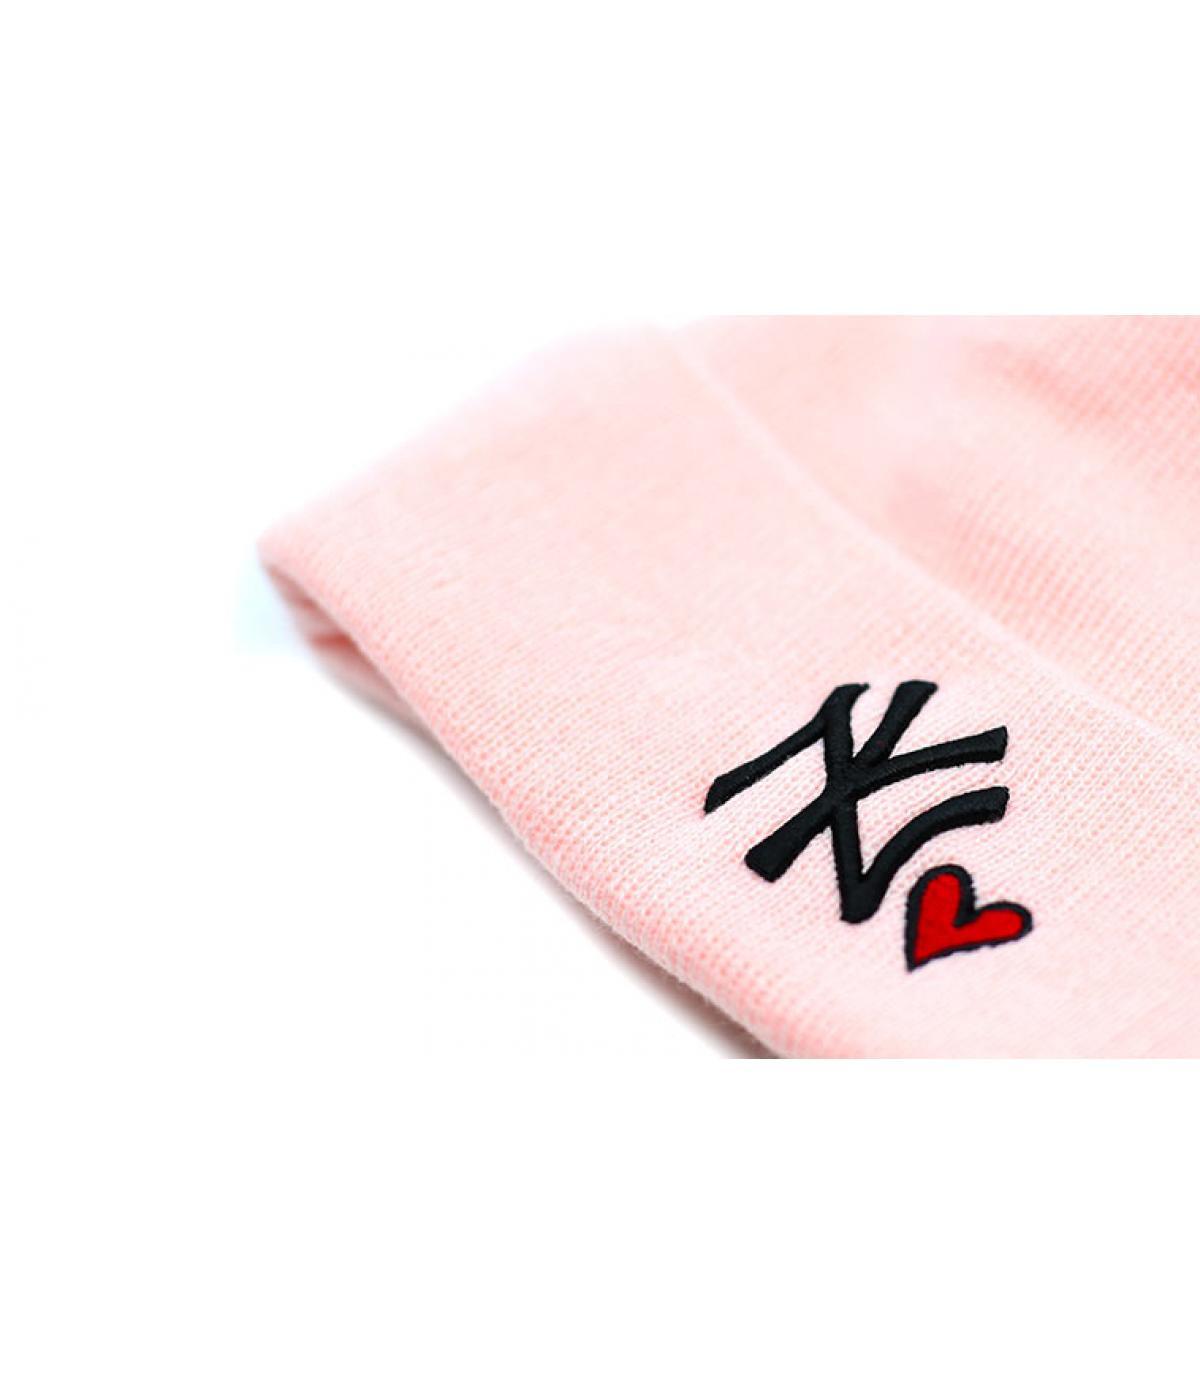 Details Bonnet Wmns Heart NY knit pink - afbeeling 3